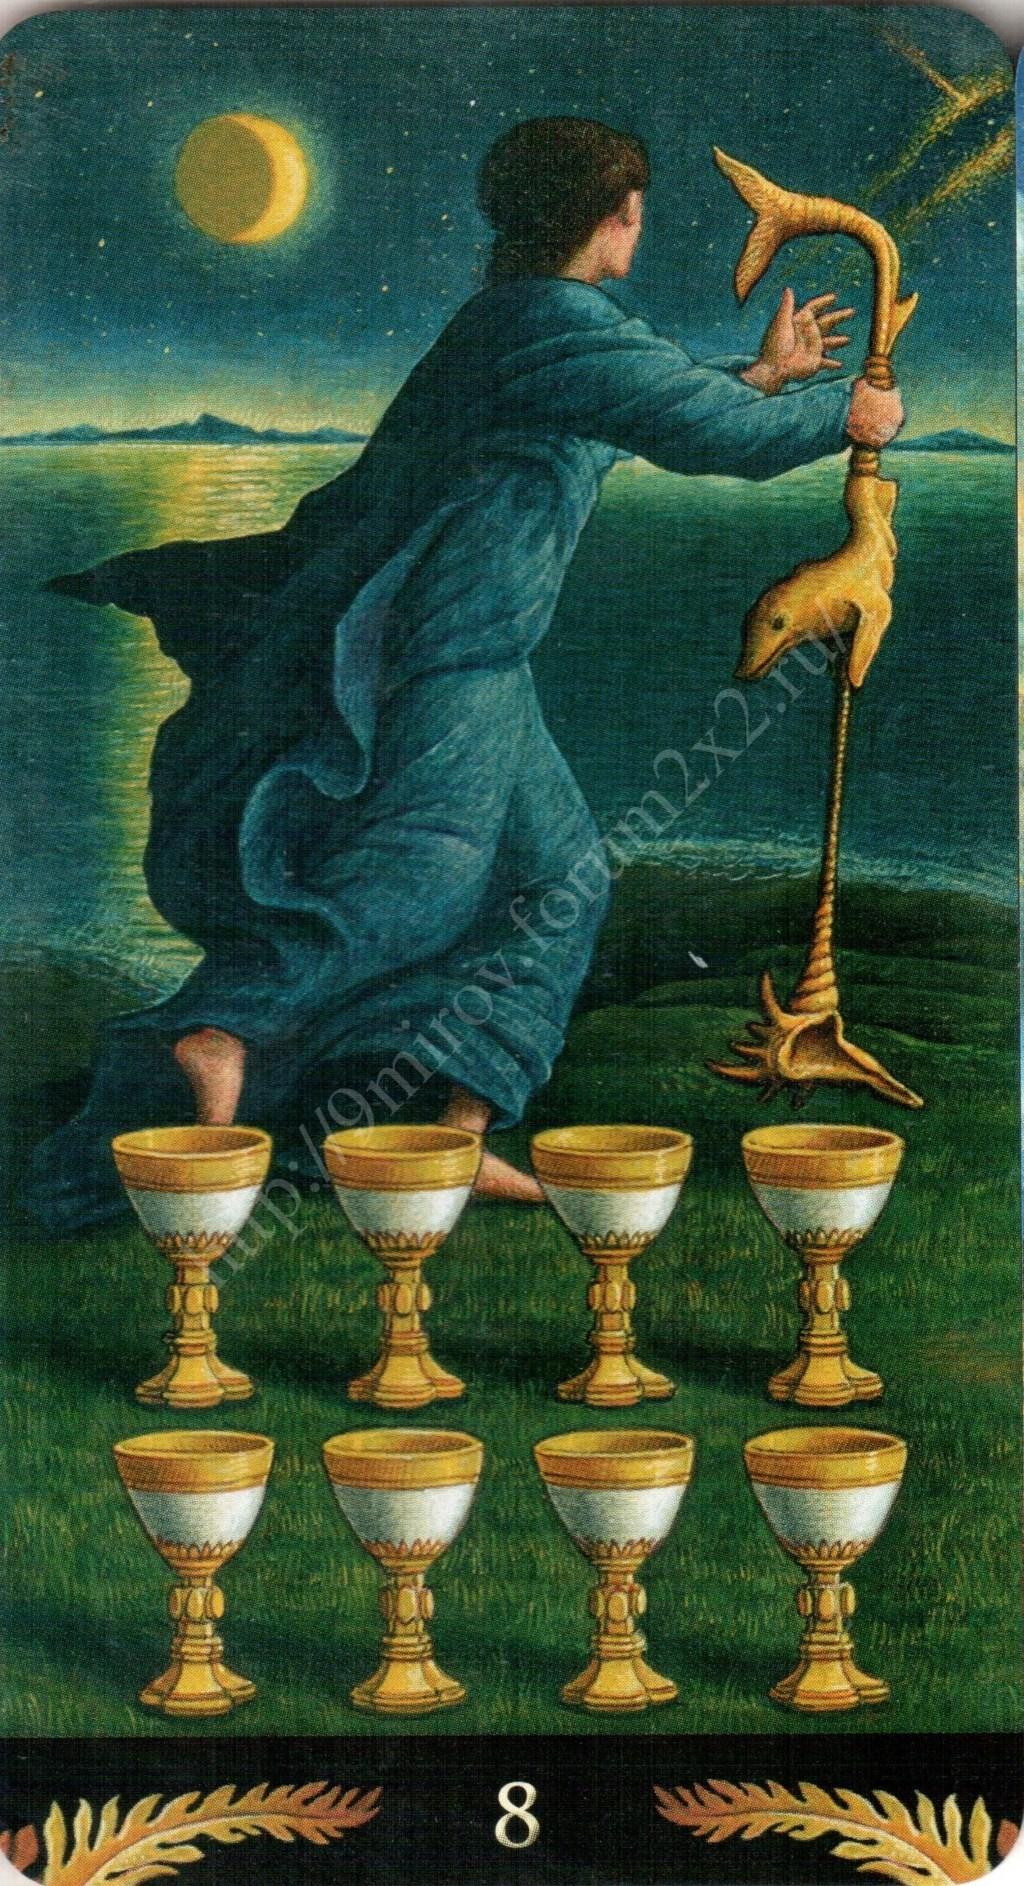 Таро Прерафаэлитов (Pre-Raphaelite Tarot) Галерея Water391